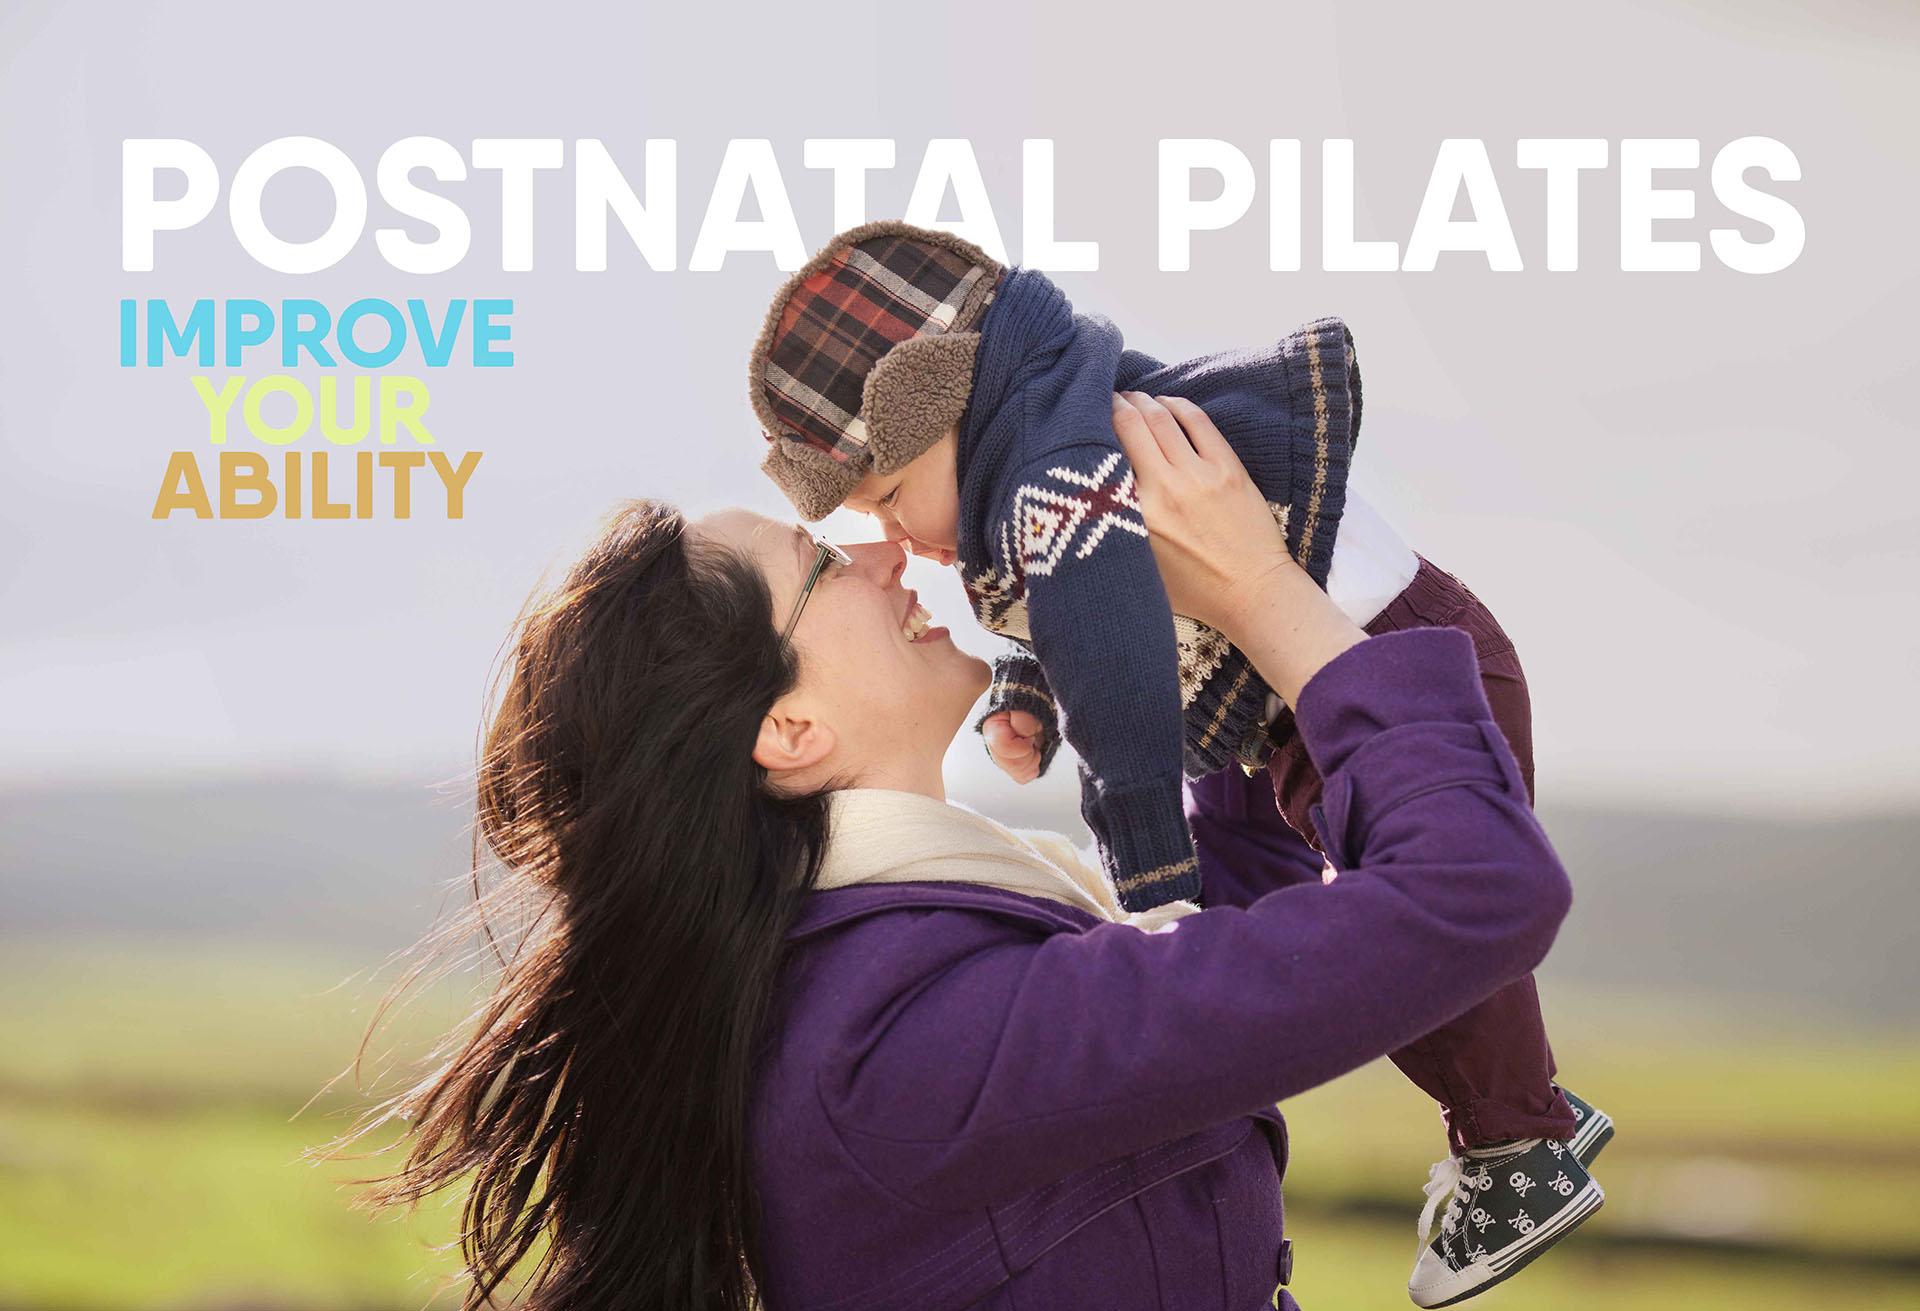 Physio Pilates MK - Specialist Postnatal Pilates Classes in Milton Keynes's main image